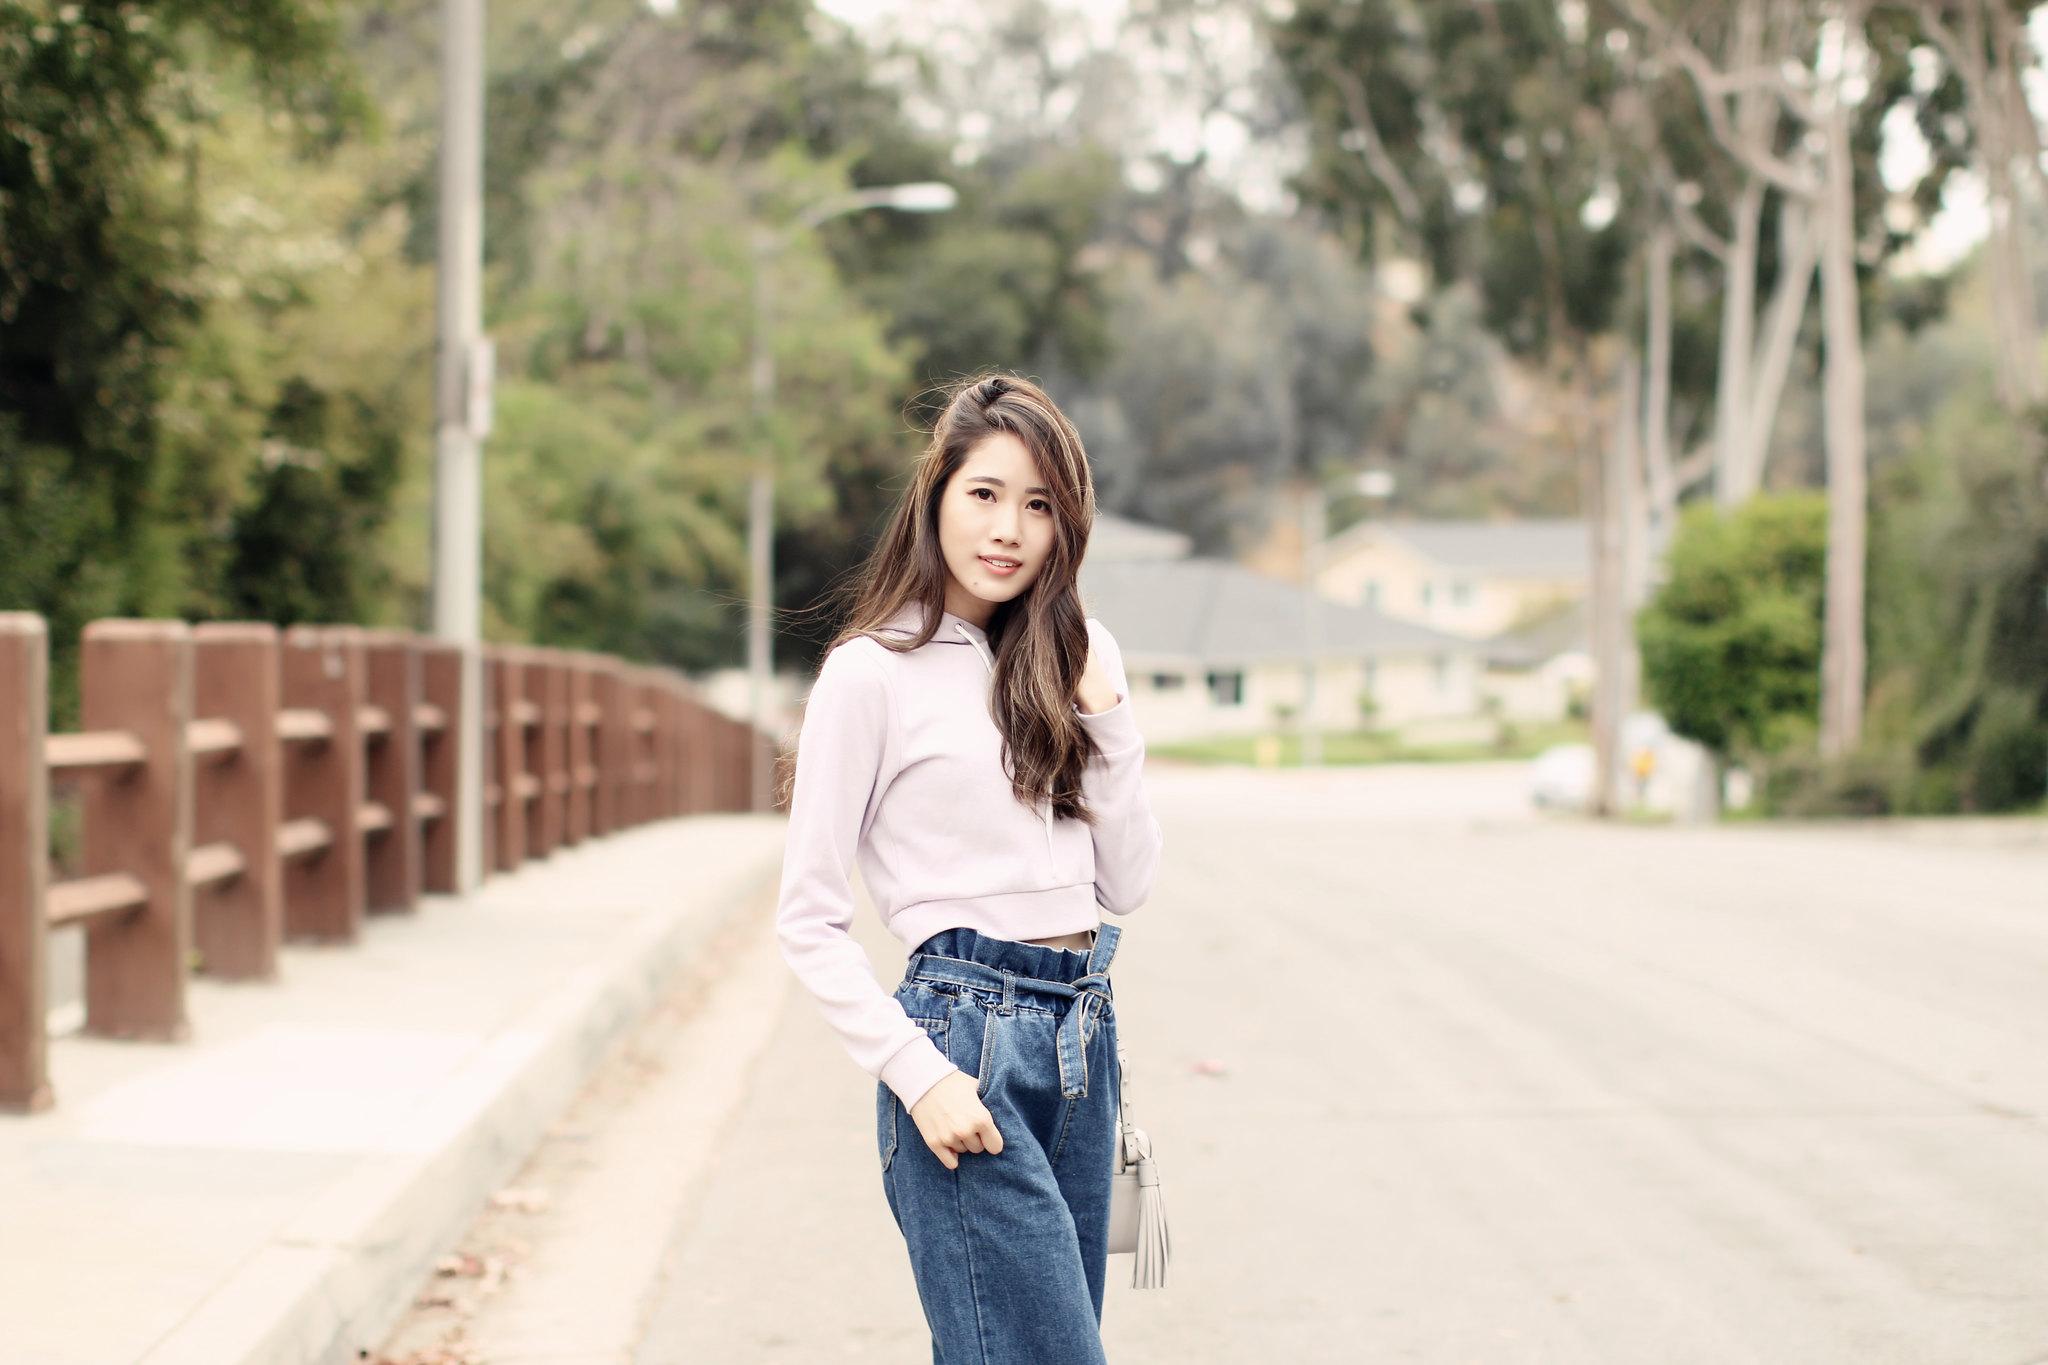 5057-ootd-fashion-style-outfitoftheday-wiwt-streetstyle-zara-f21xme-denim-thrifted-guess-koreanfashion-lookbook-elizabeeetht-clothestoyouuu